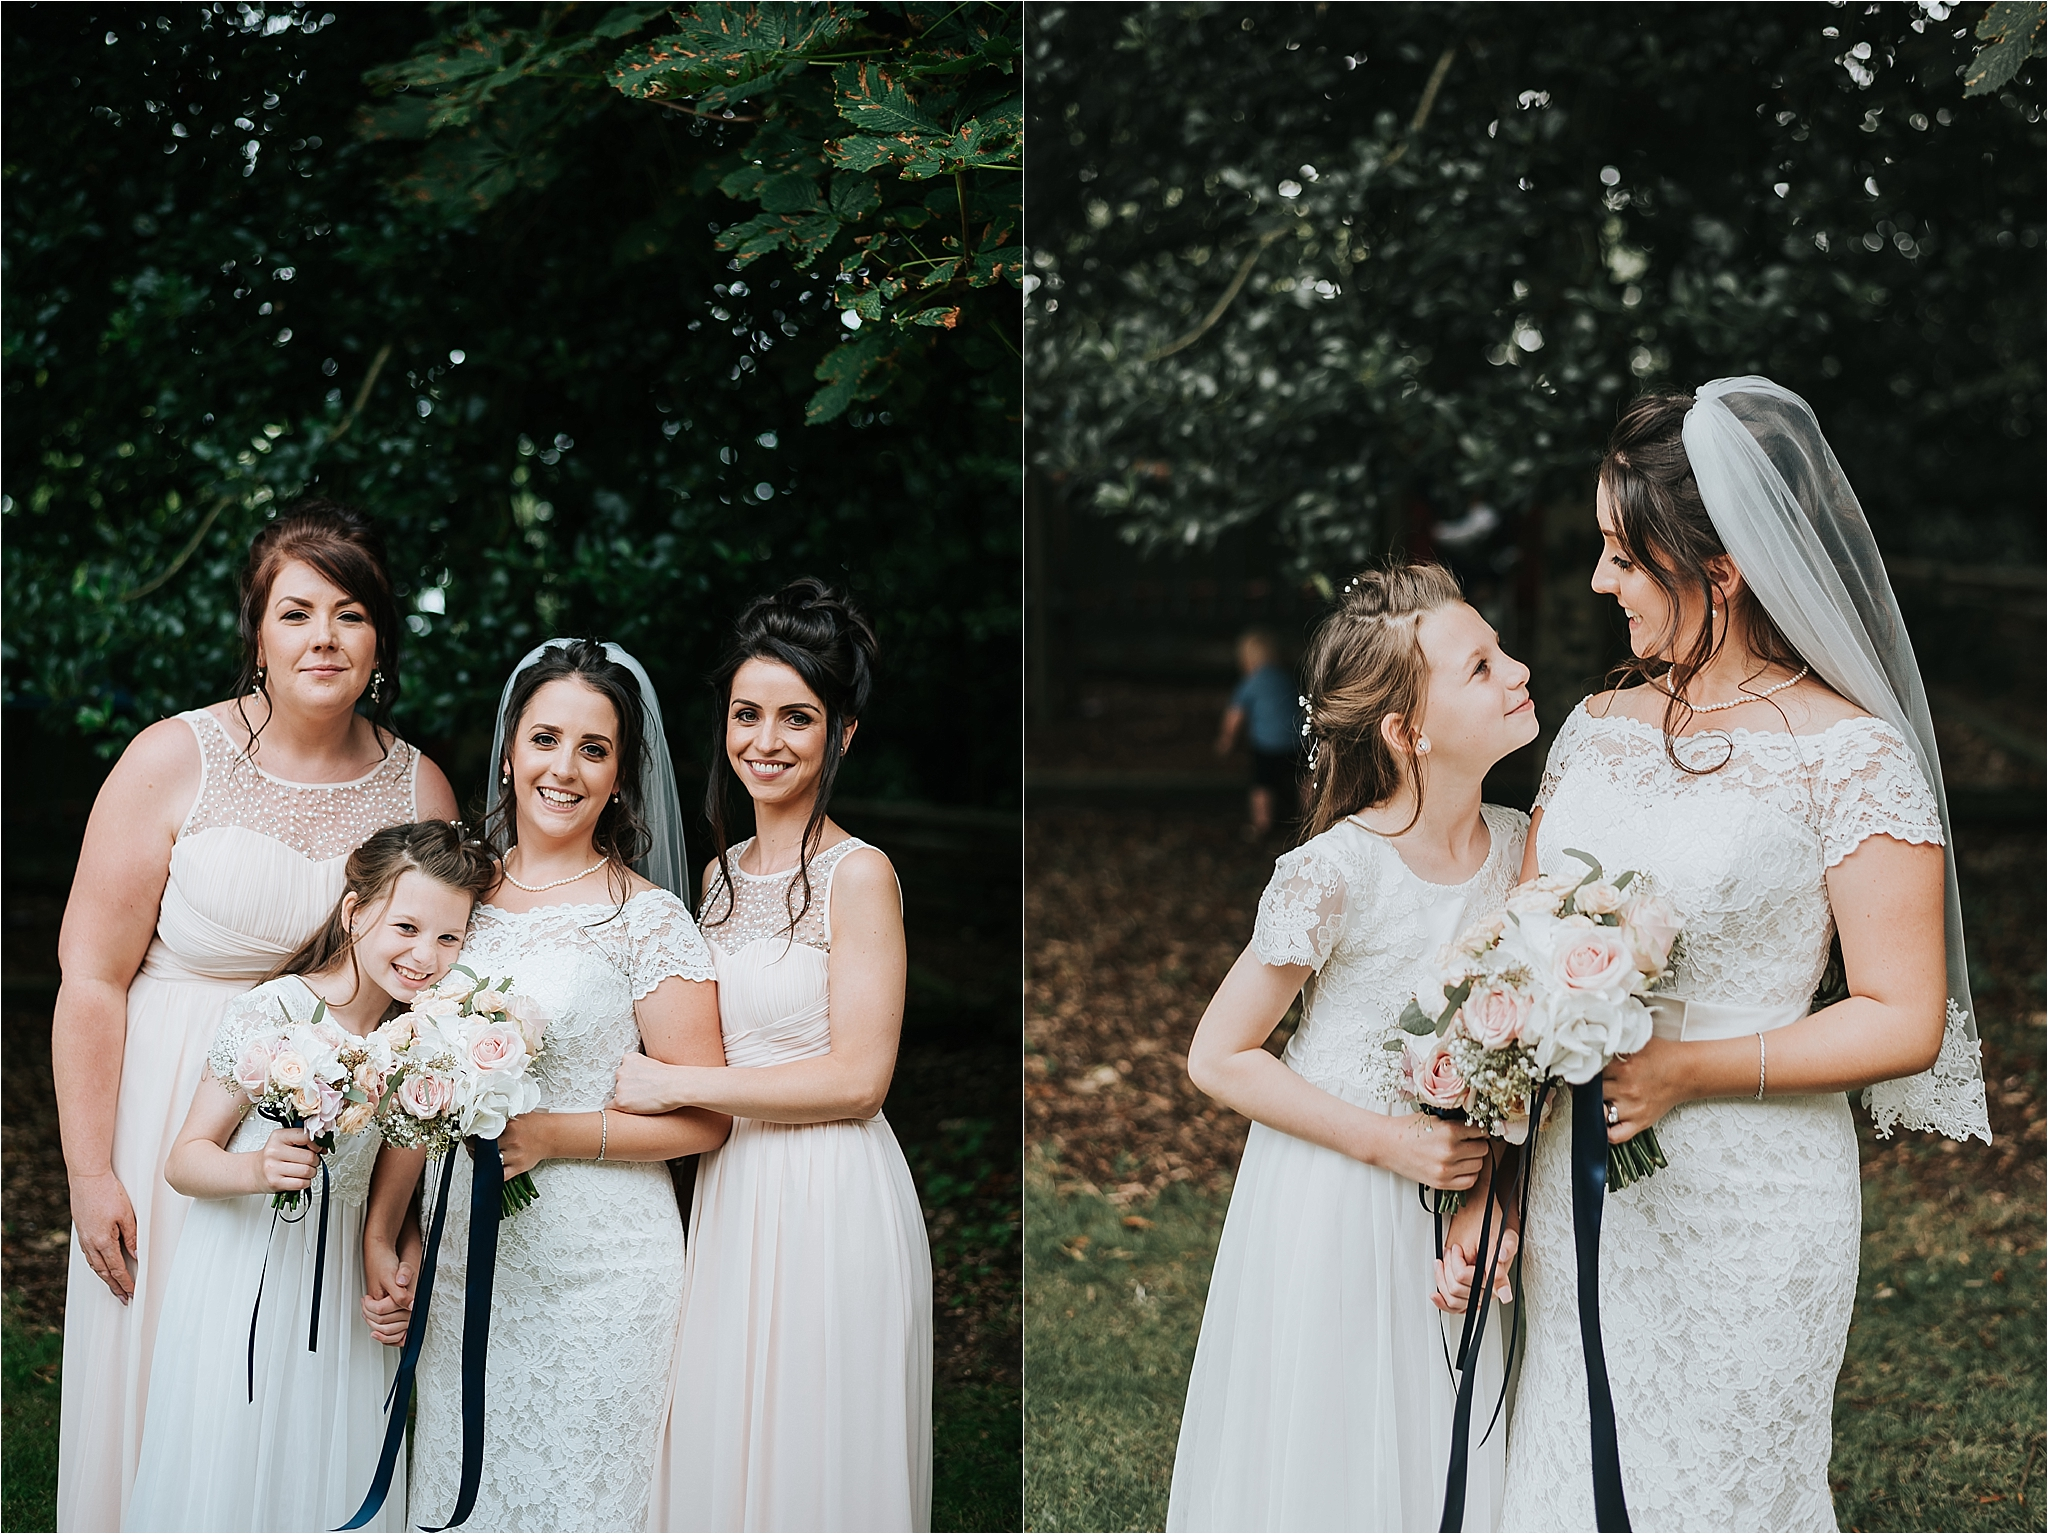 thevilla+lancashire+wreagreen+wedding+photographer35.jpg